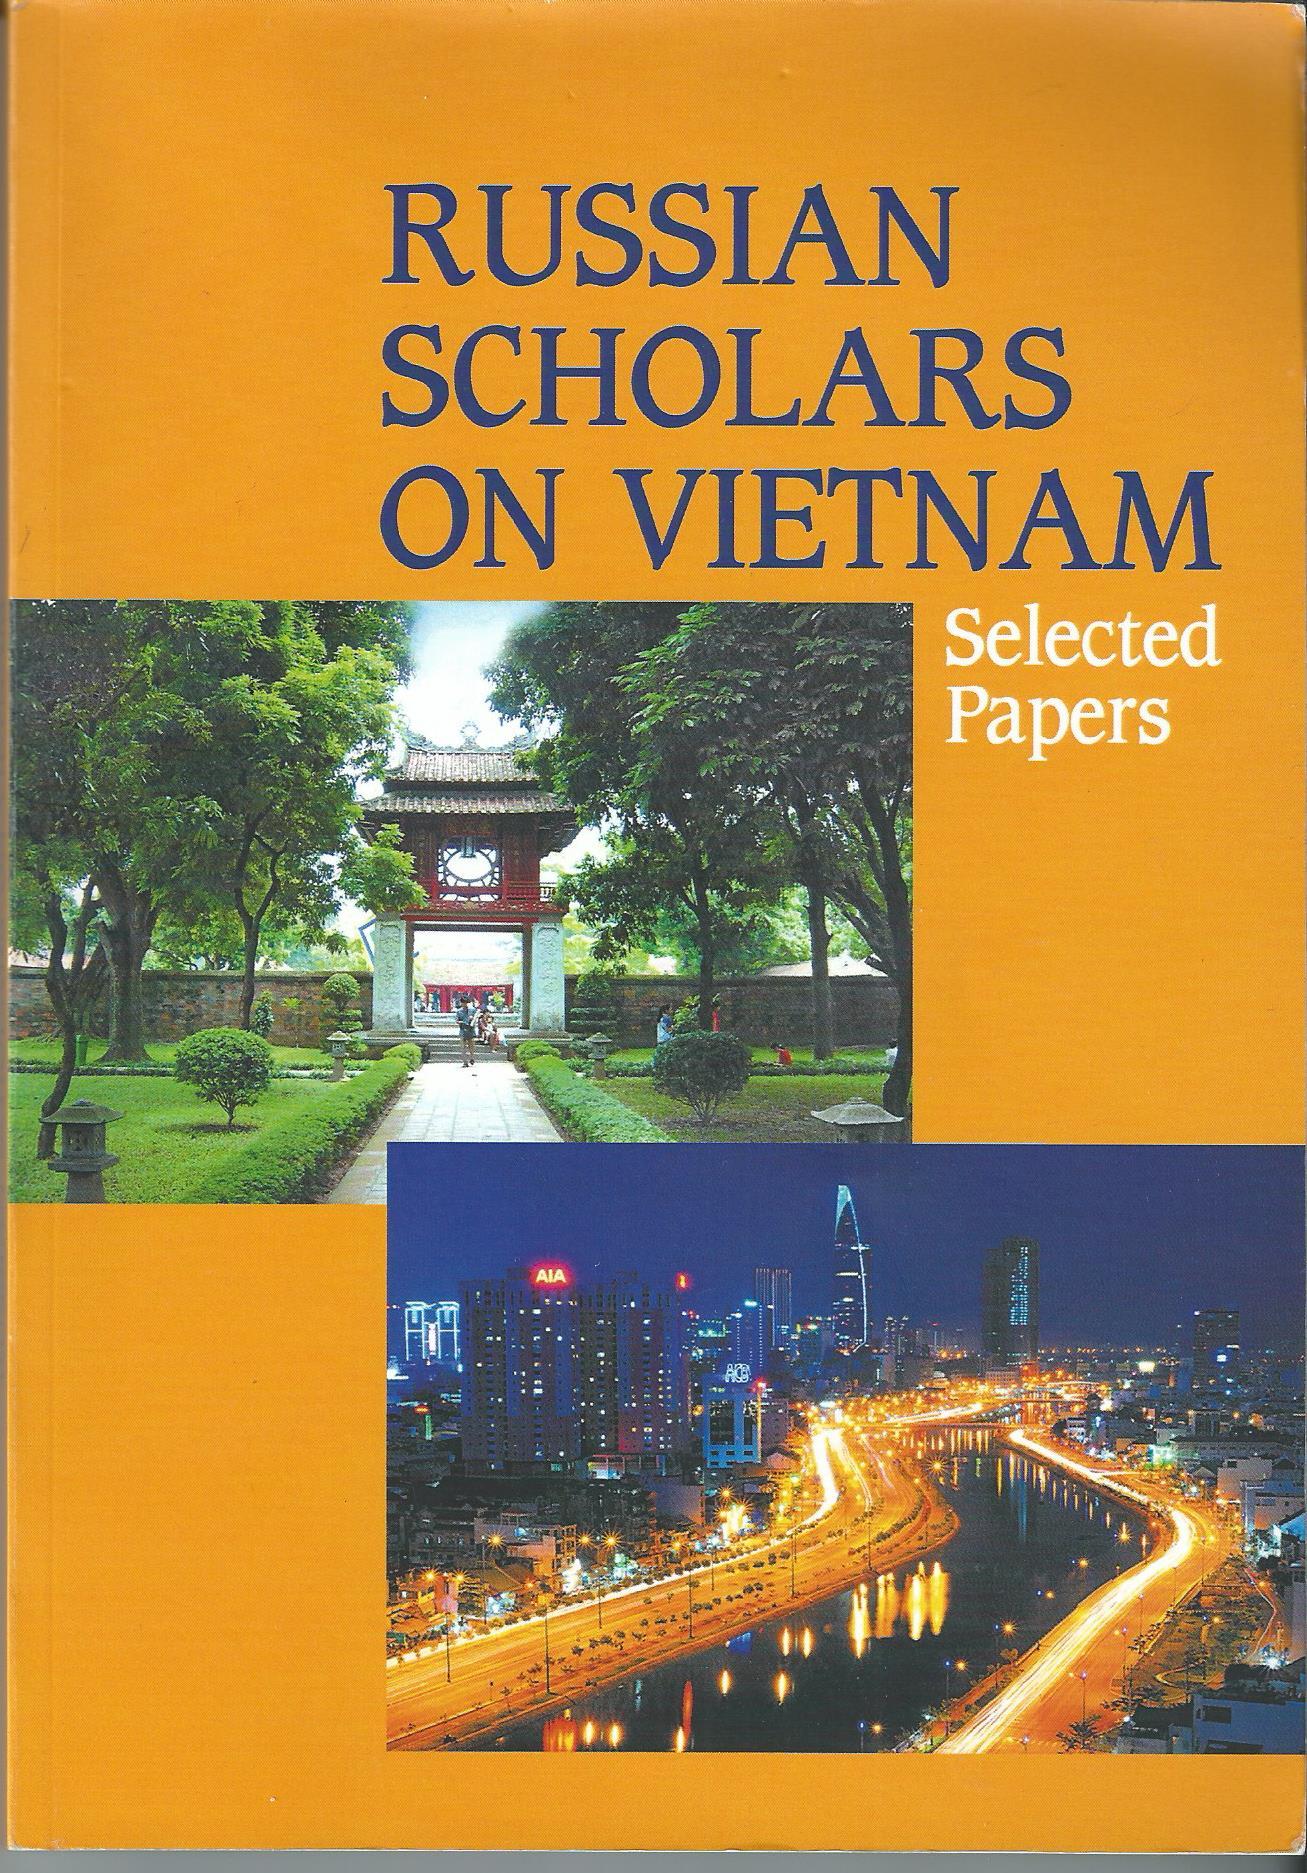 Russian scholars on Vietnam. Selected Papers